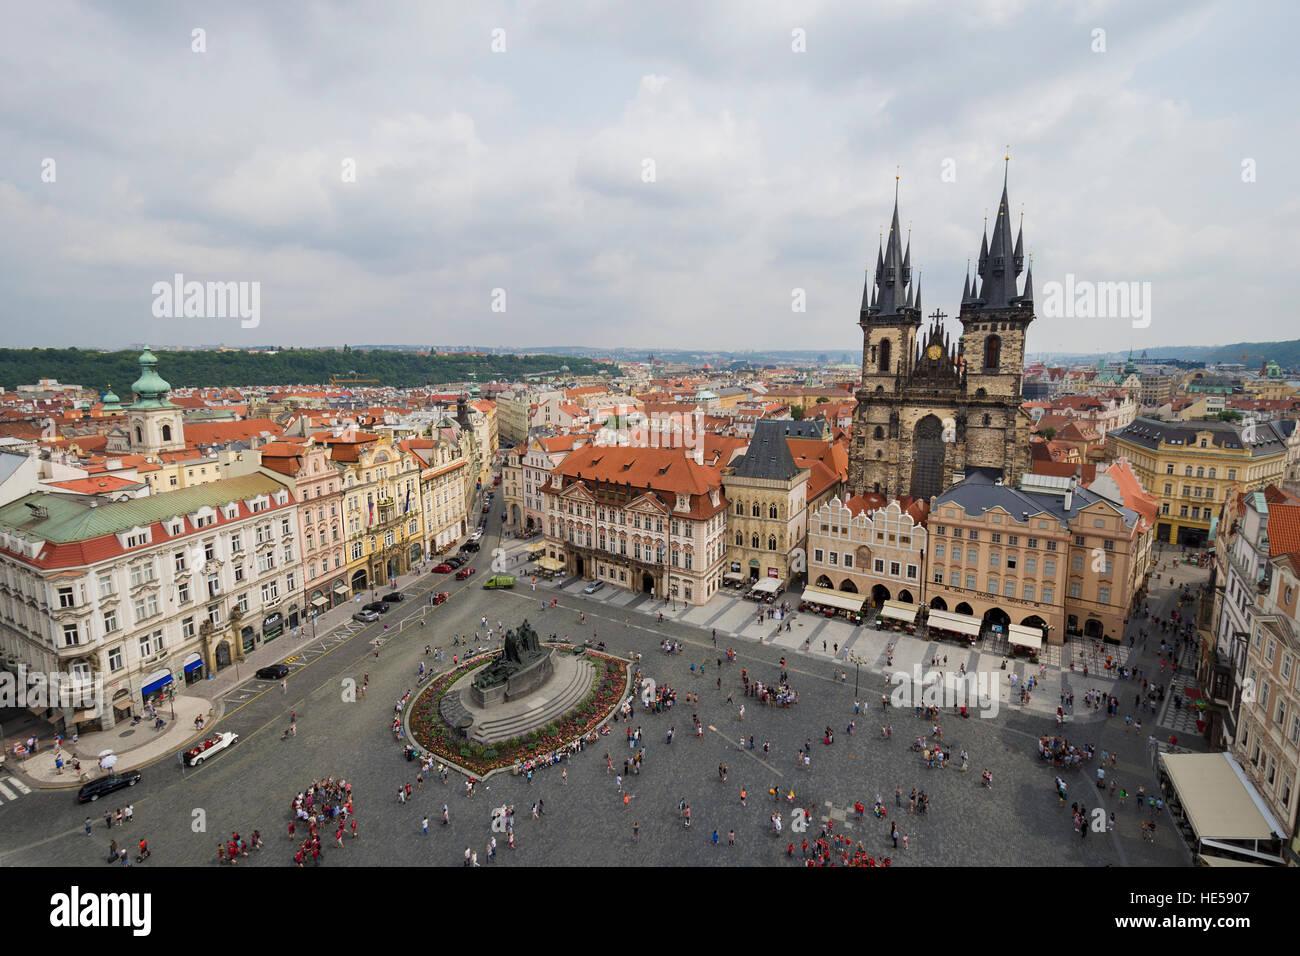 Panorama-Aussicht auf Prager Altstädter Ring an bewölkten Tag Stockbild